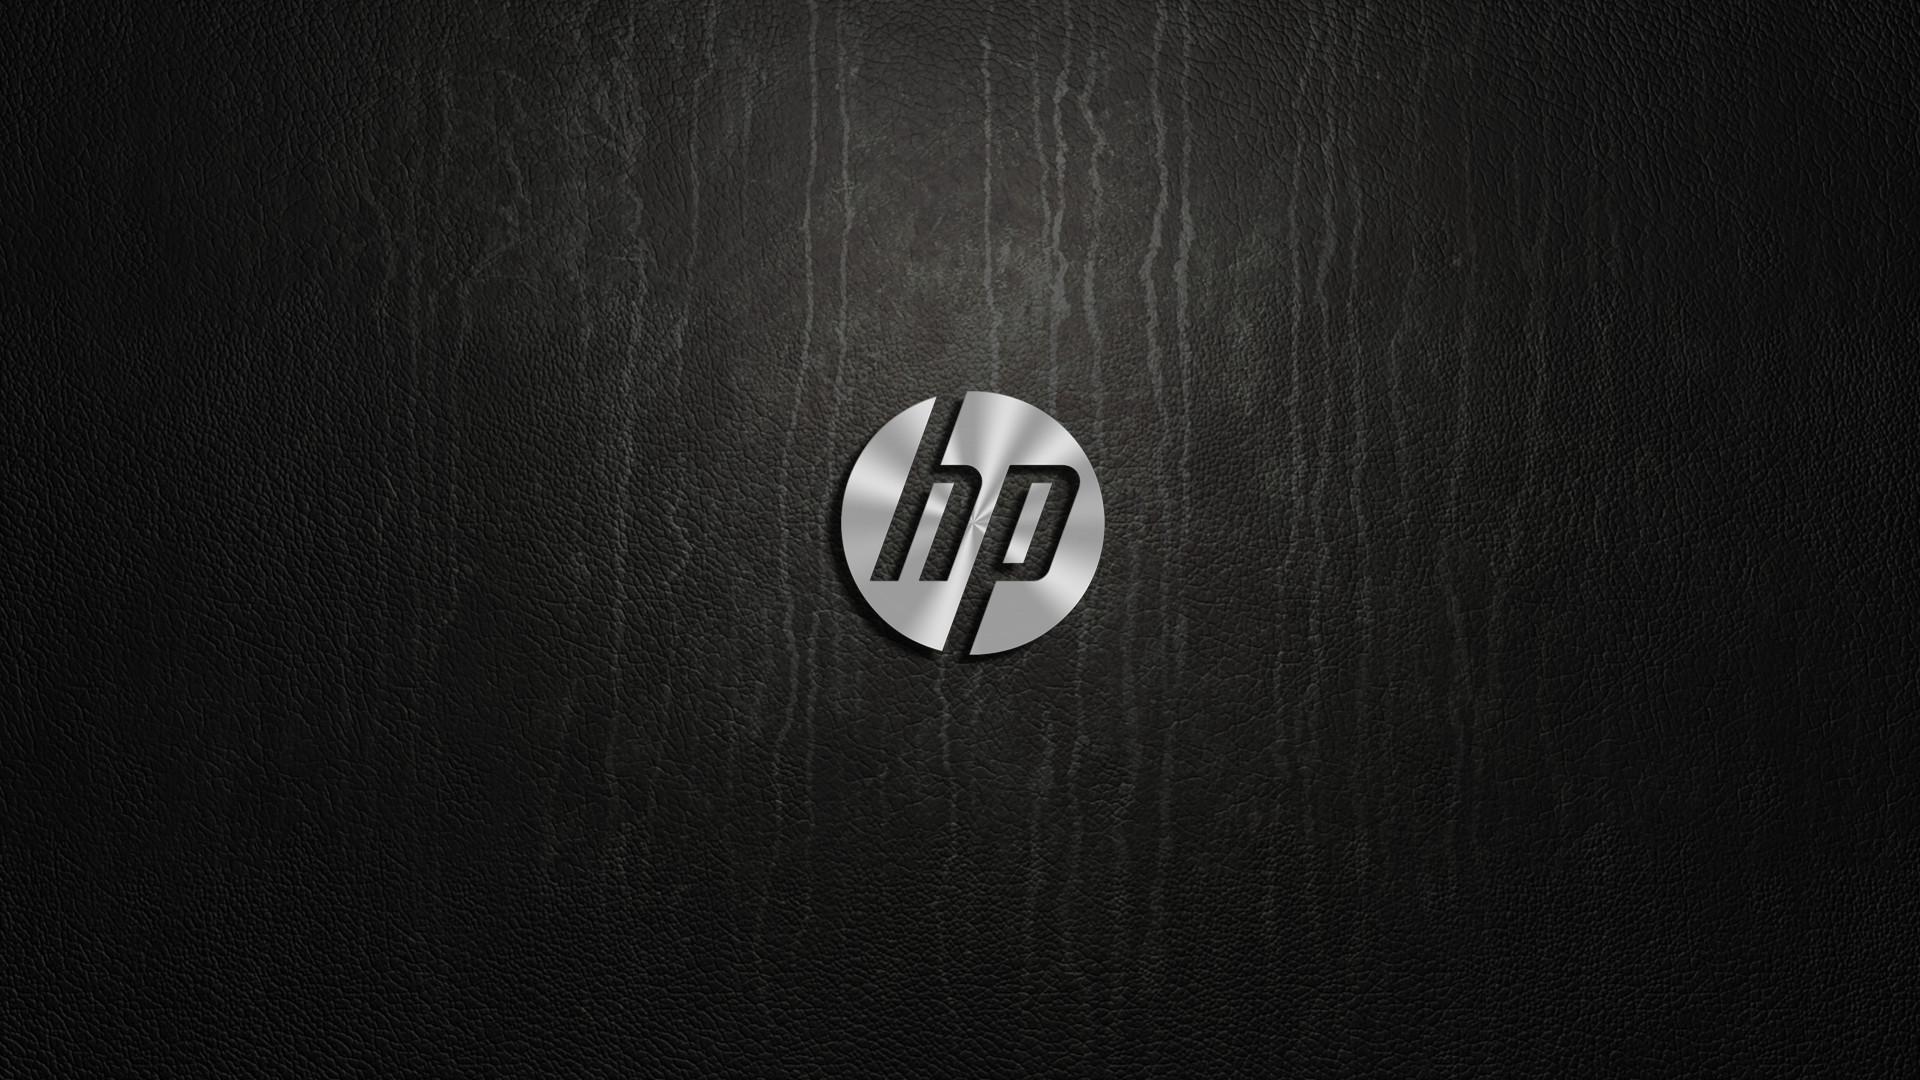 Res: 1920x1080, HP Spectre Wallpaper - HP Support Forum - 5831579